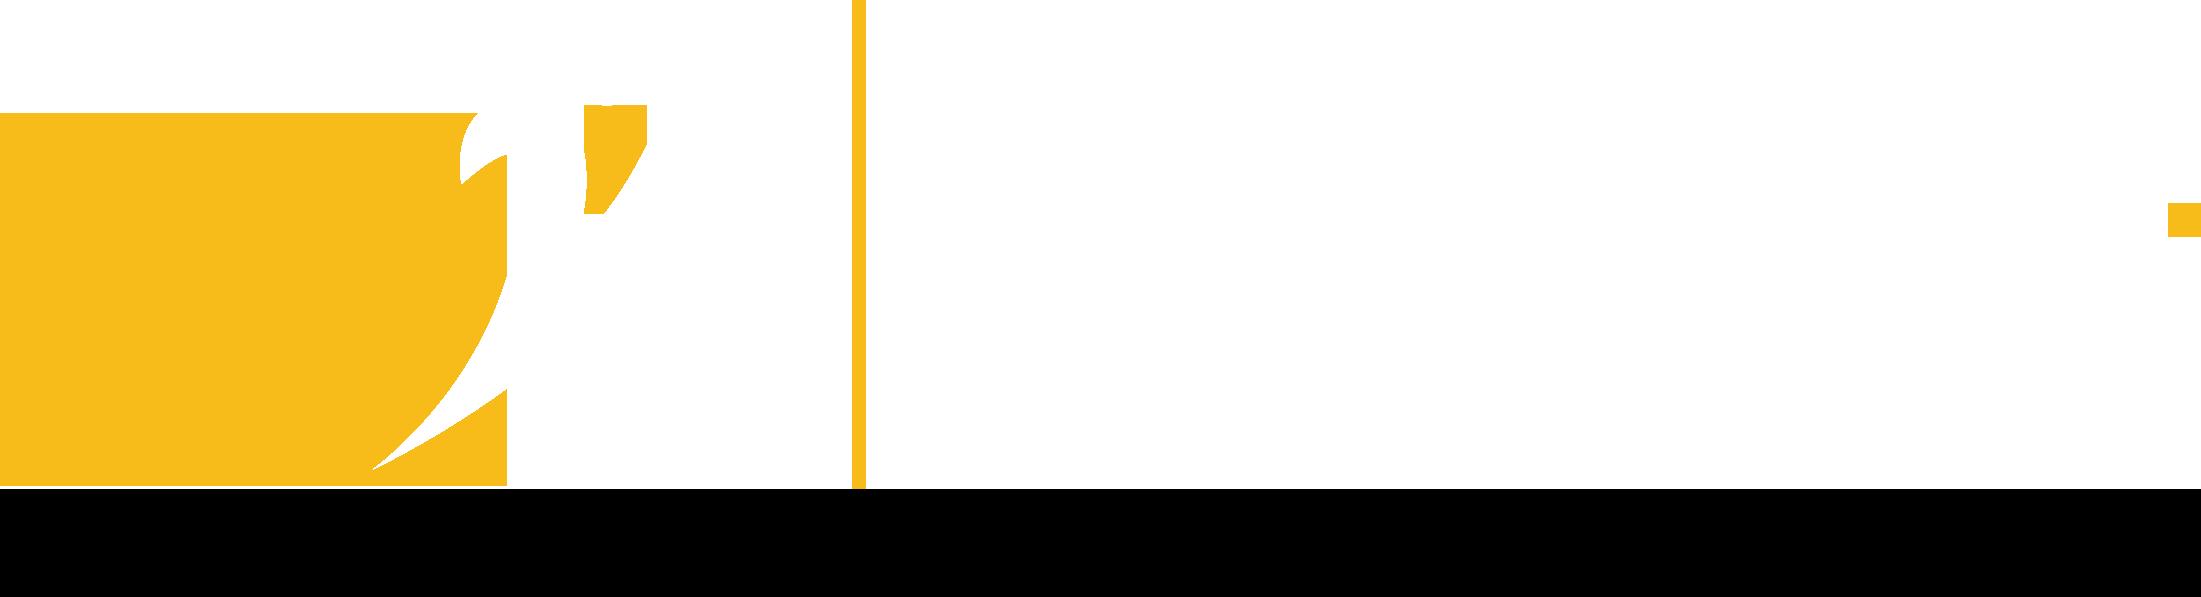 https://campaign-image.eu/zohocampaigns/71975000000270082_zc_v33_1615749999175_fokus_msp_logo_weiß_gelb.png